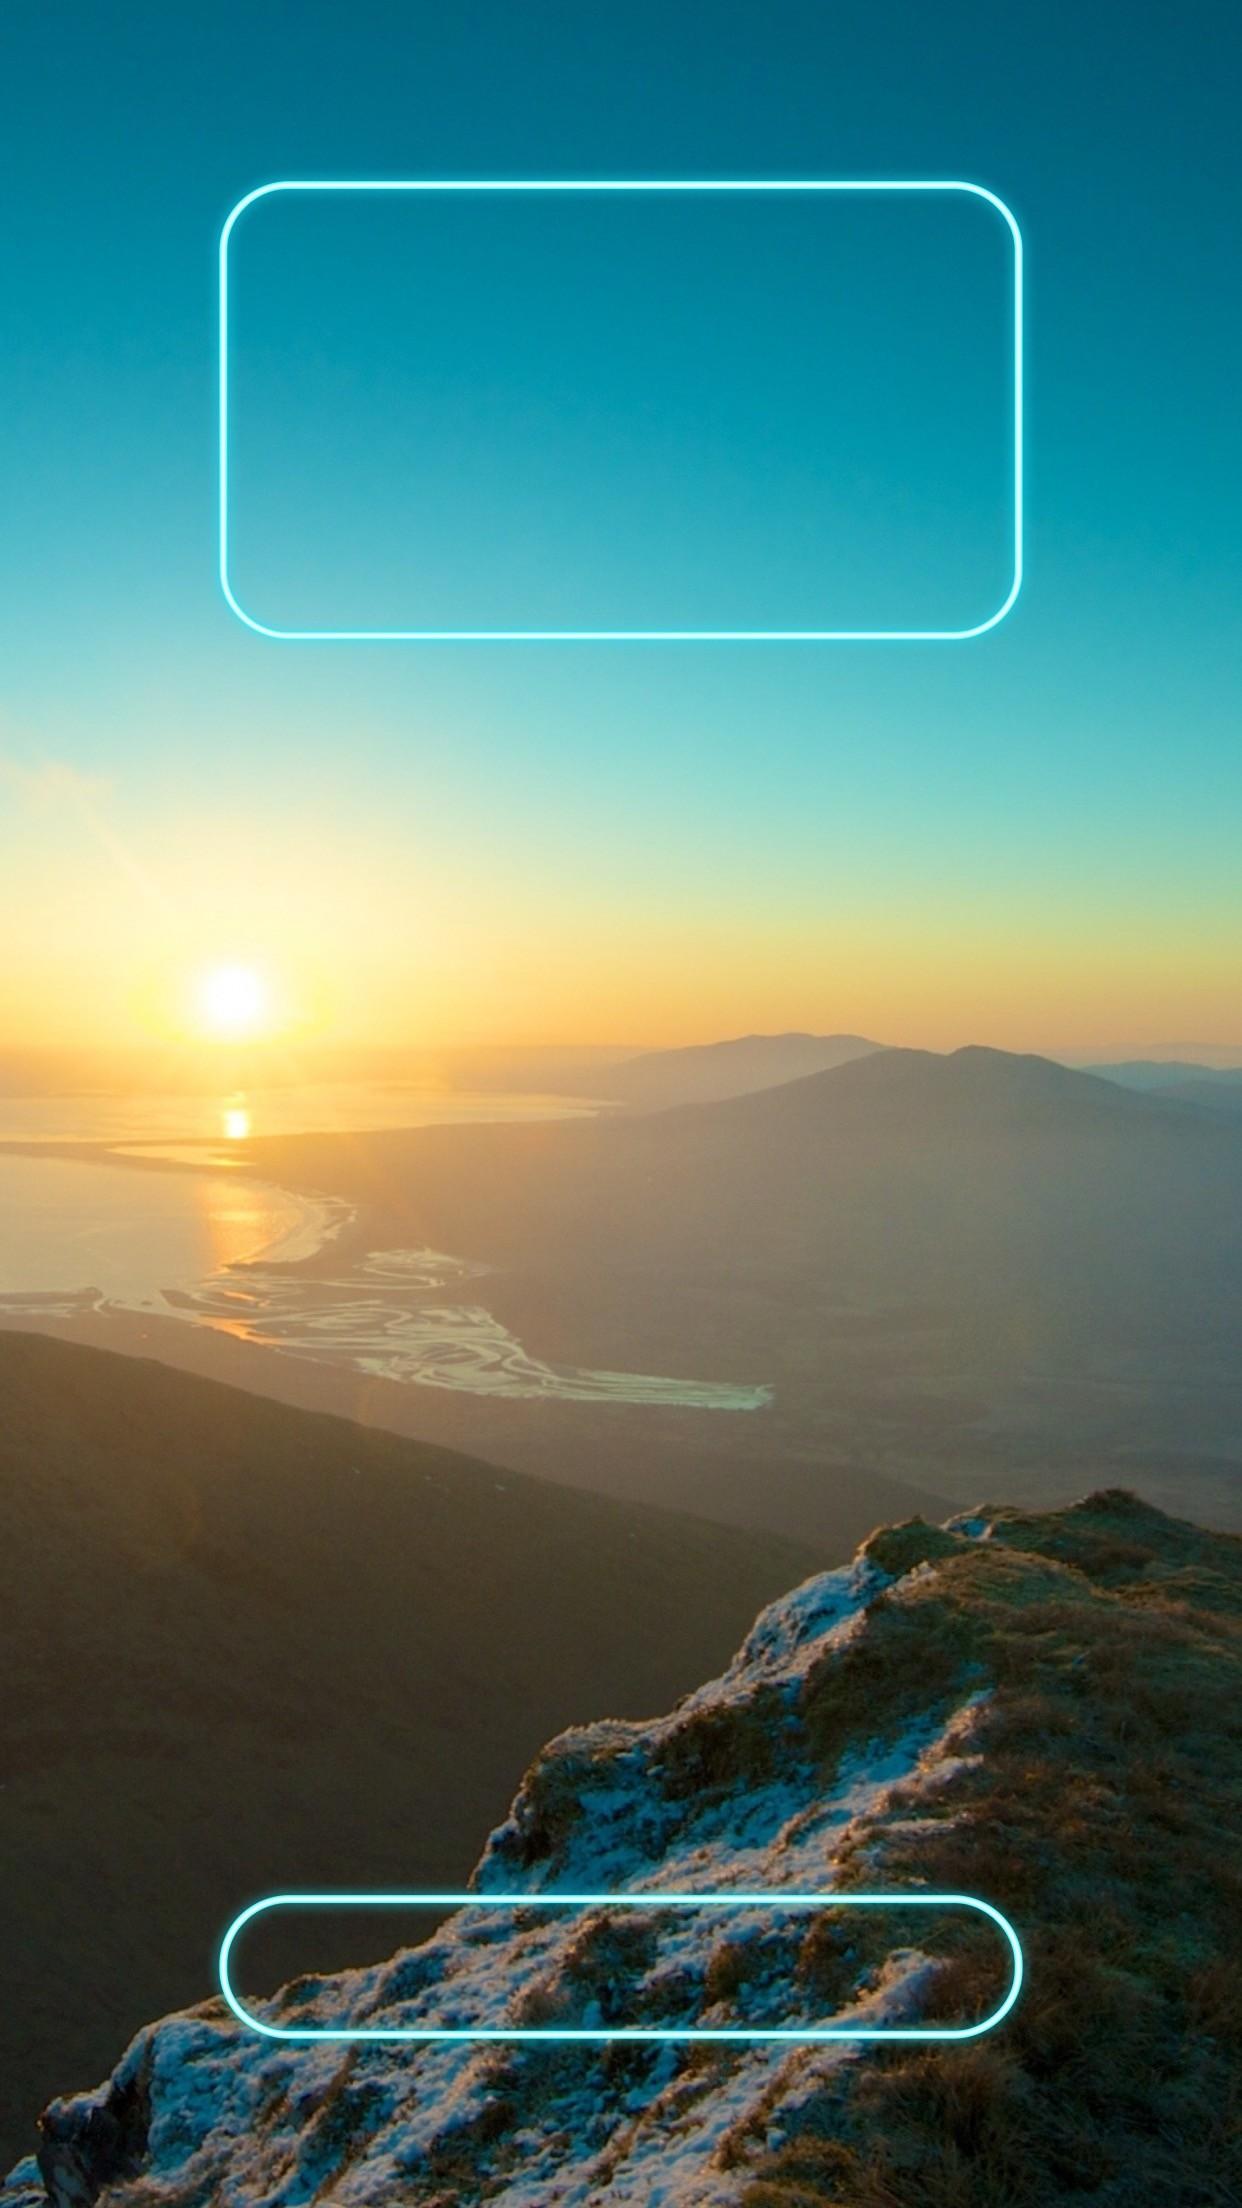 Iphone Lock Screen Wallpaper Hd , HD Wallpaper & Backgrounds